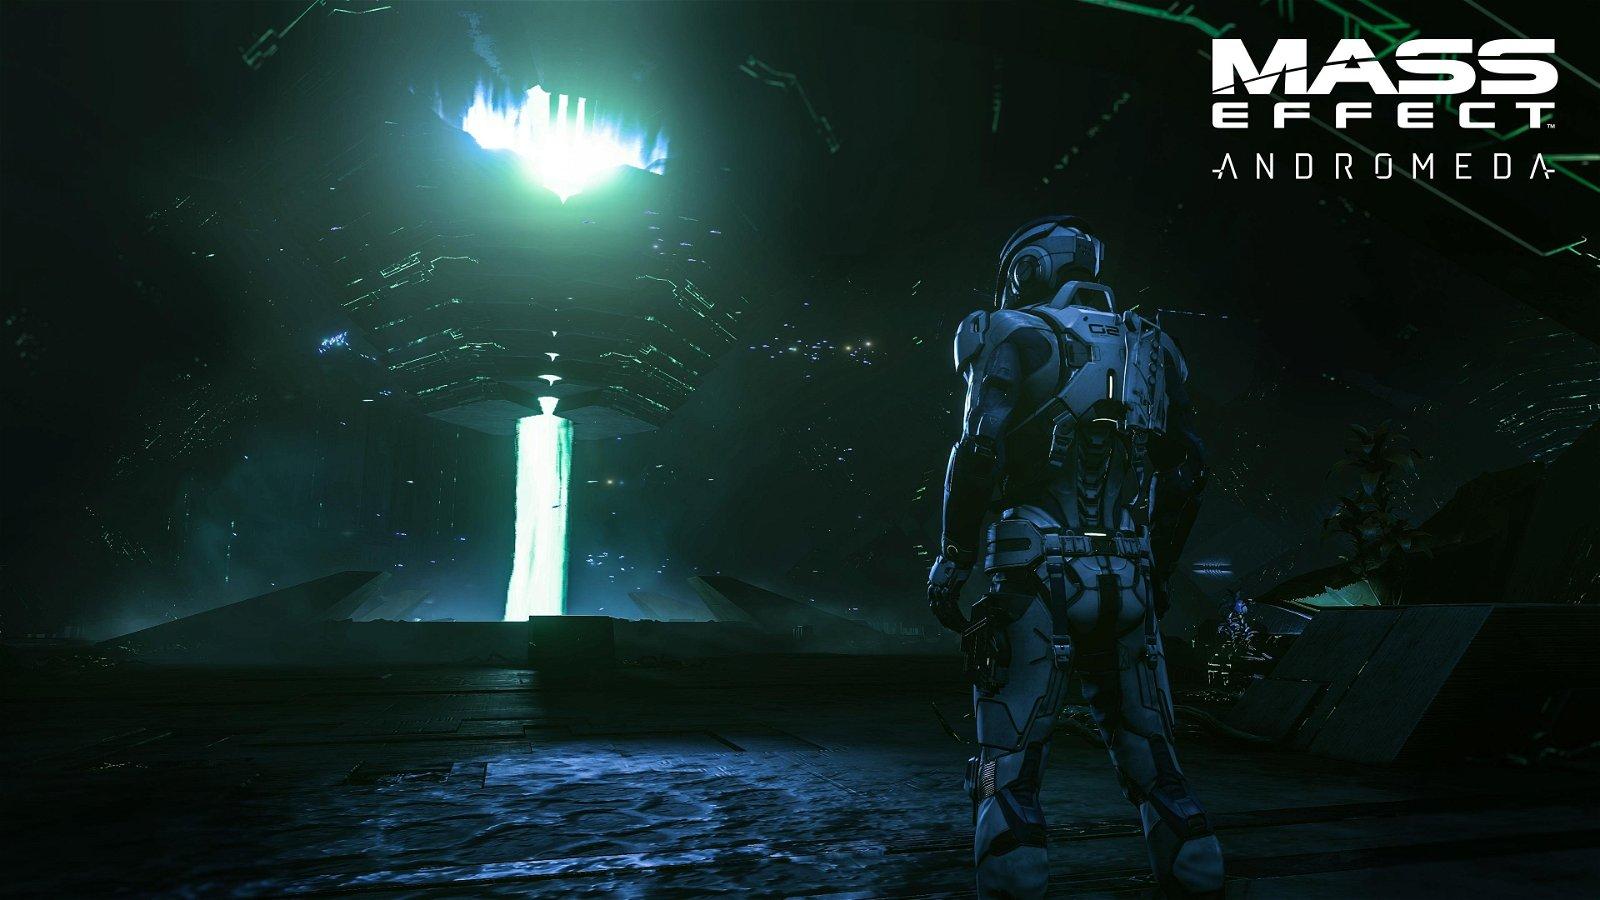 Mass Effect: Andromeda te permitirá poner voz a sus personajes